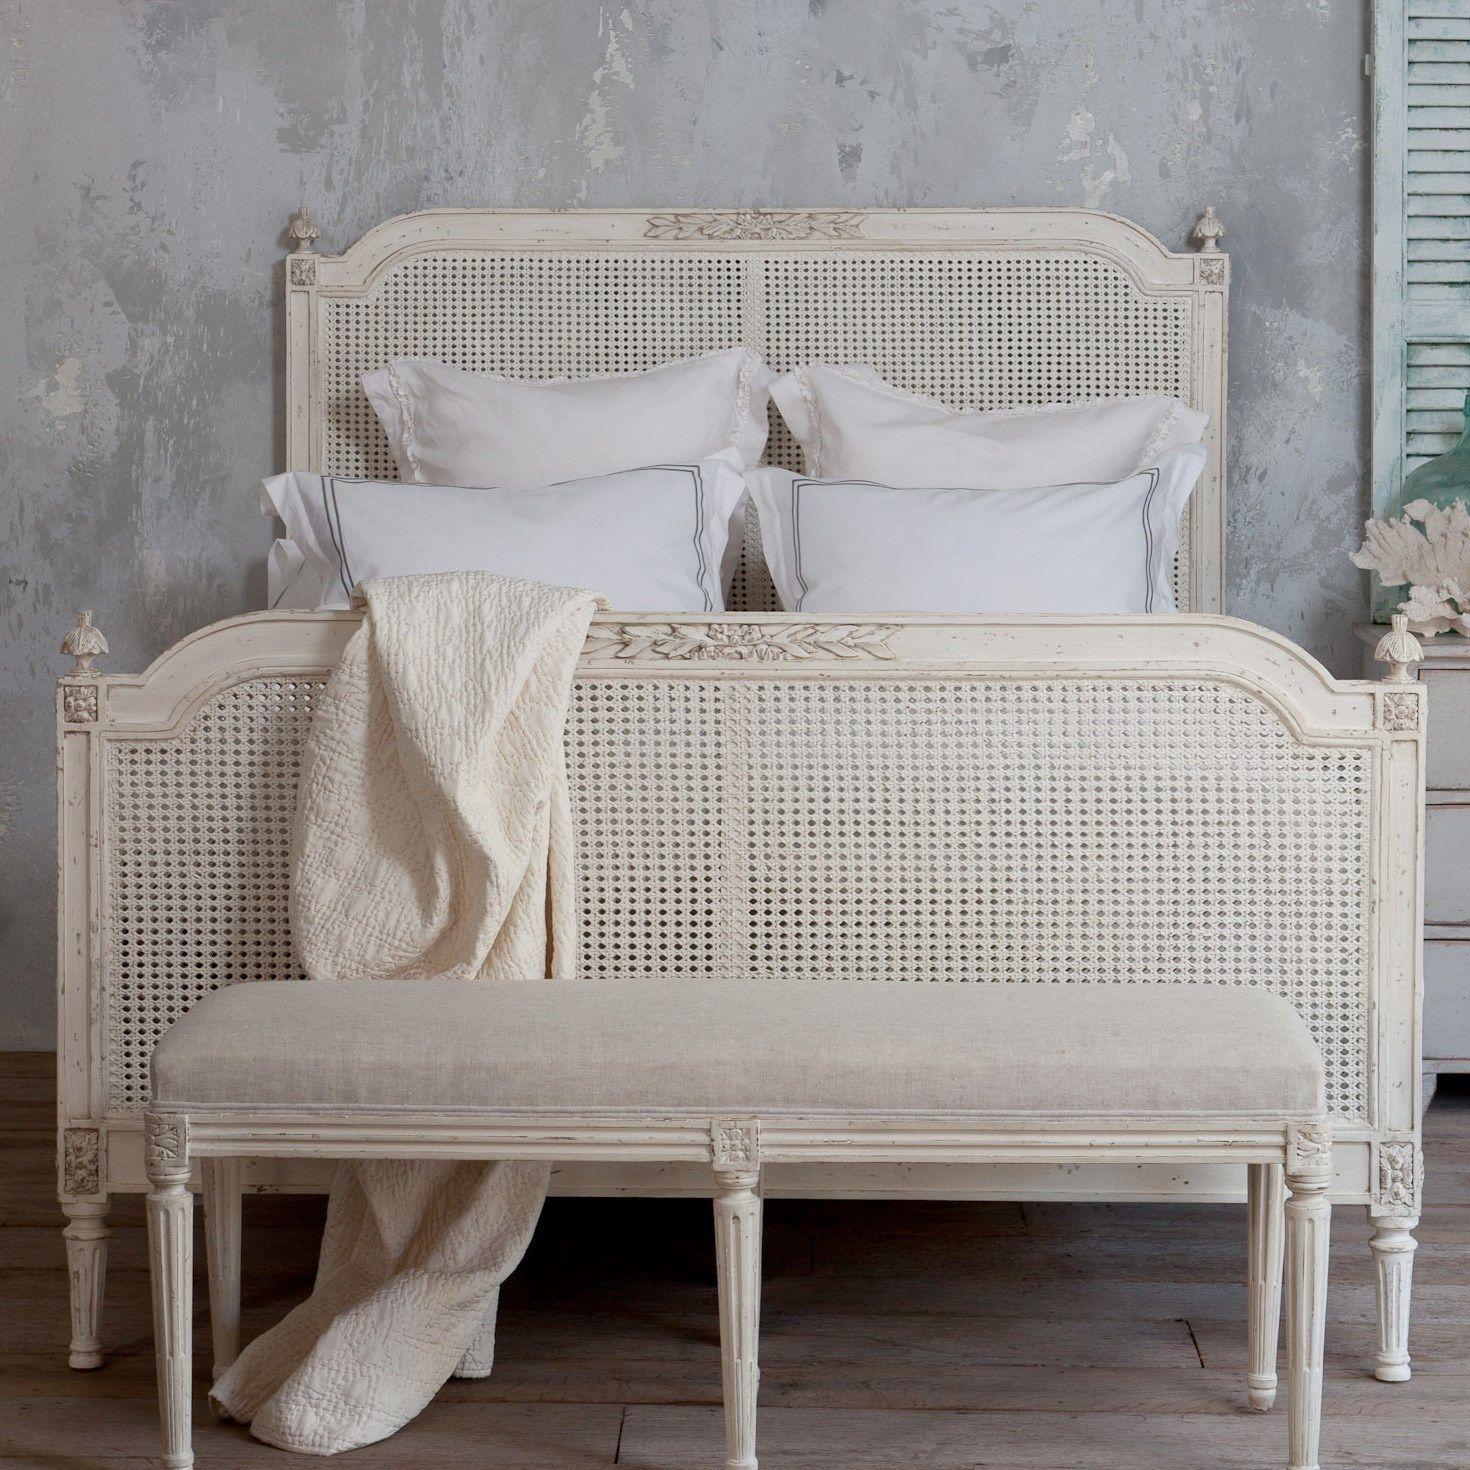 Swedish Interiordesign: Eloquence Blanka Cane Antique White Bed #laylagrayce